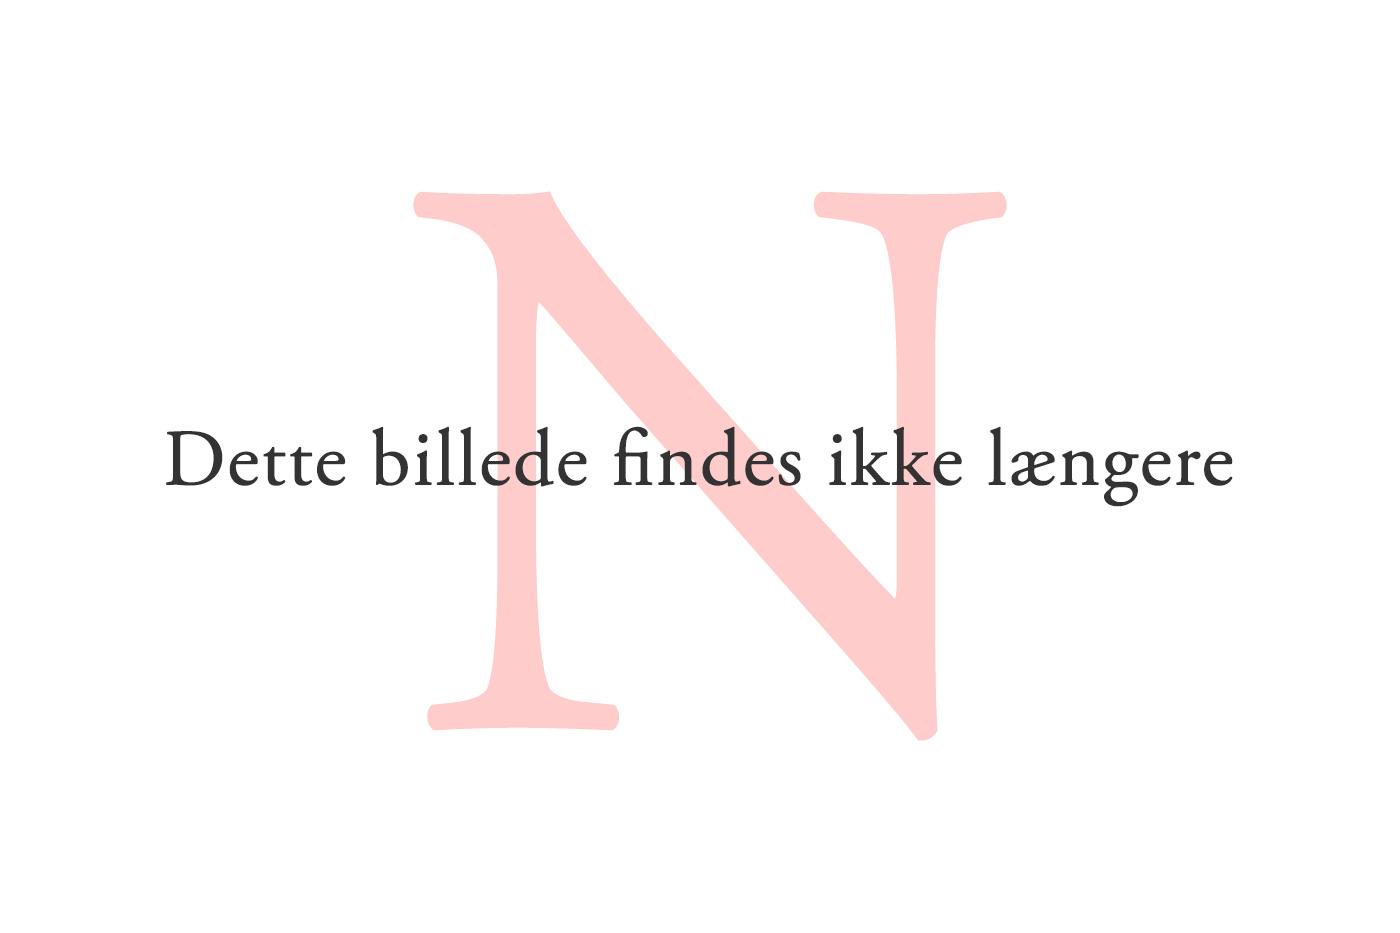 Det kan være en god idé at holde øje med, hvor i Danmark man får mest hus for pengene. Foto: Flickr